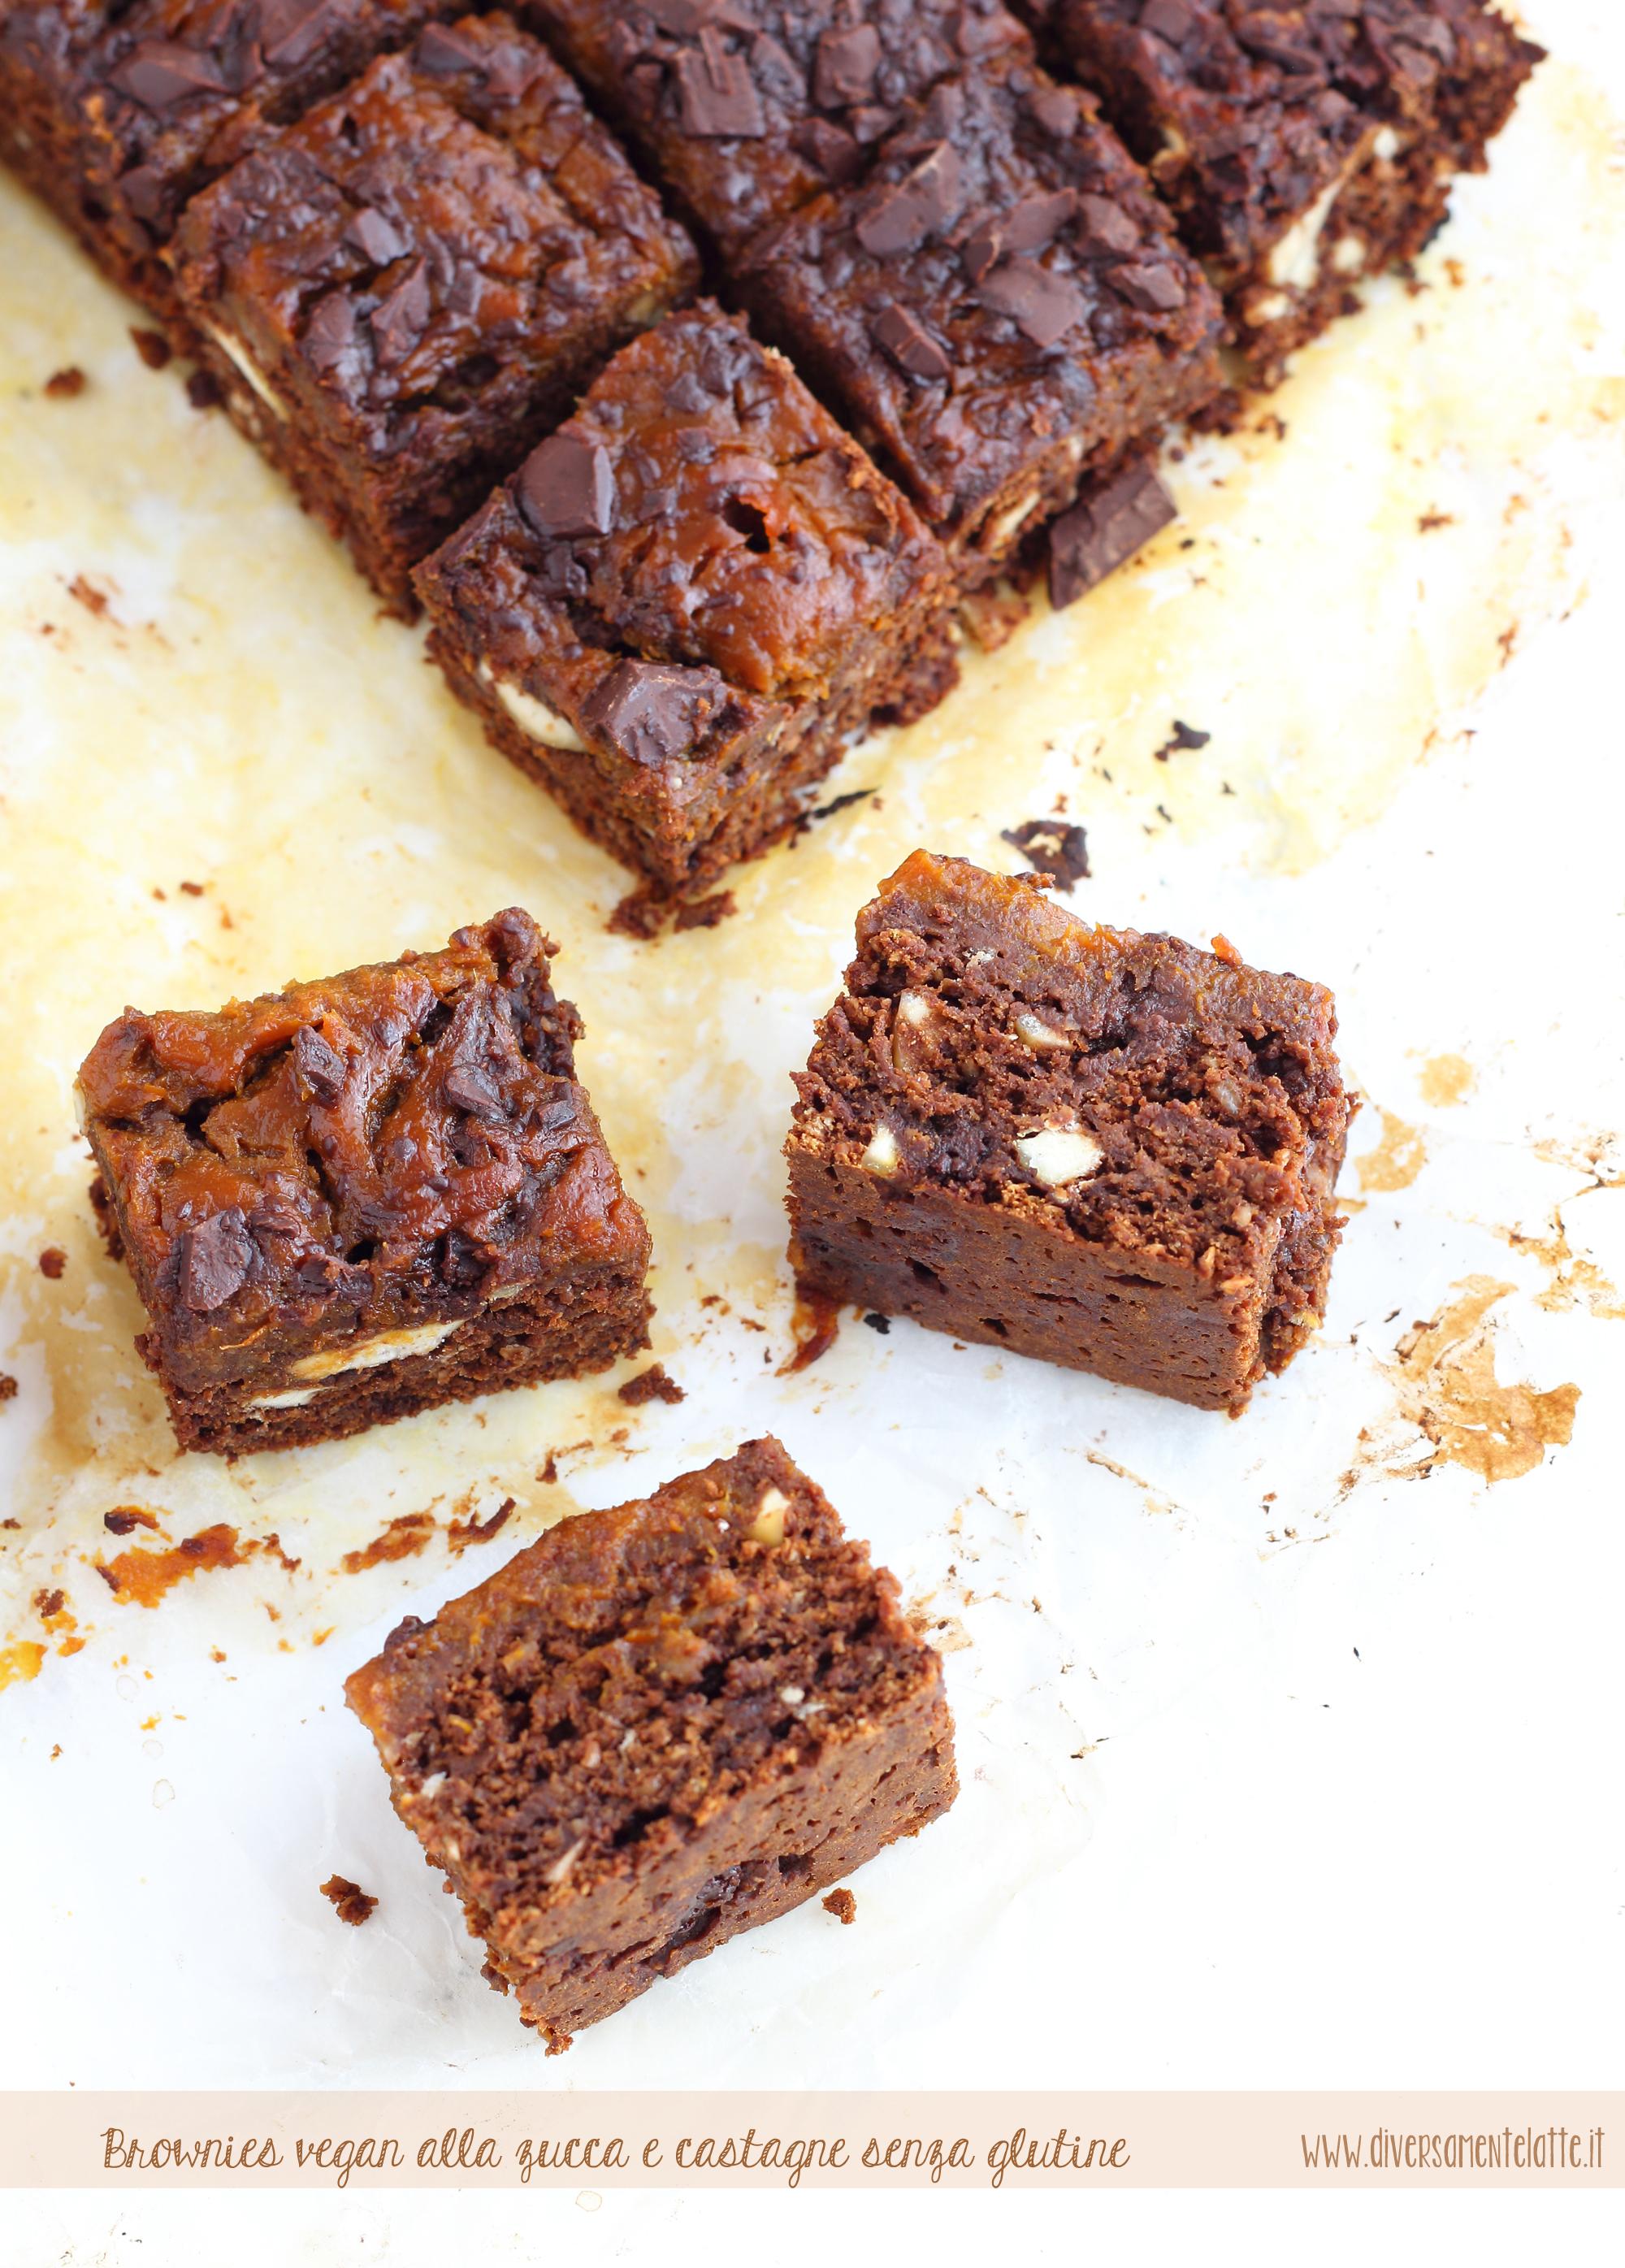 brownies zucca e castagne senza glutine senza lattosio